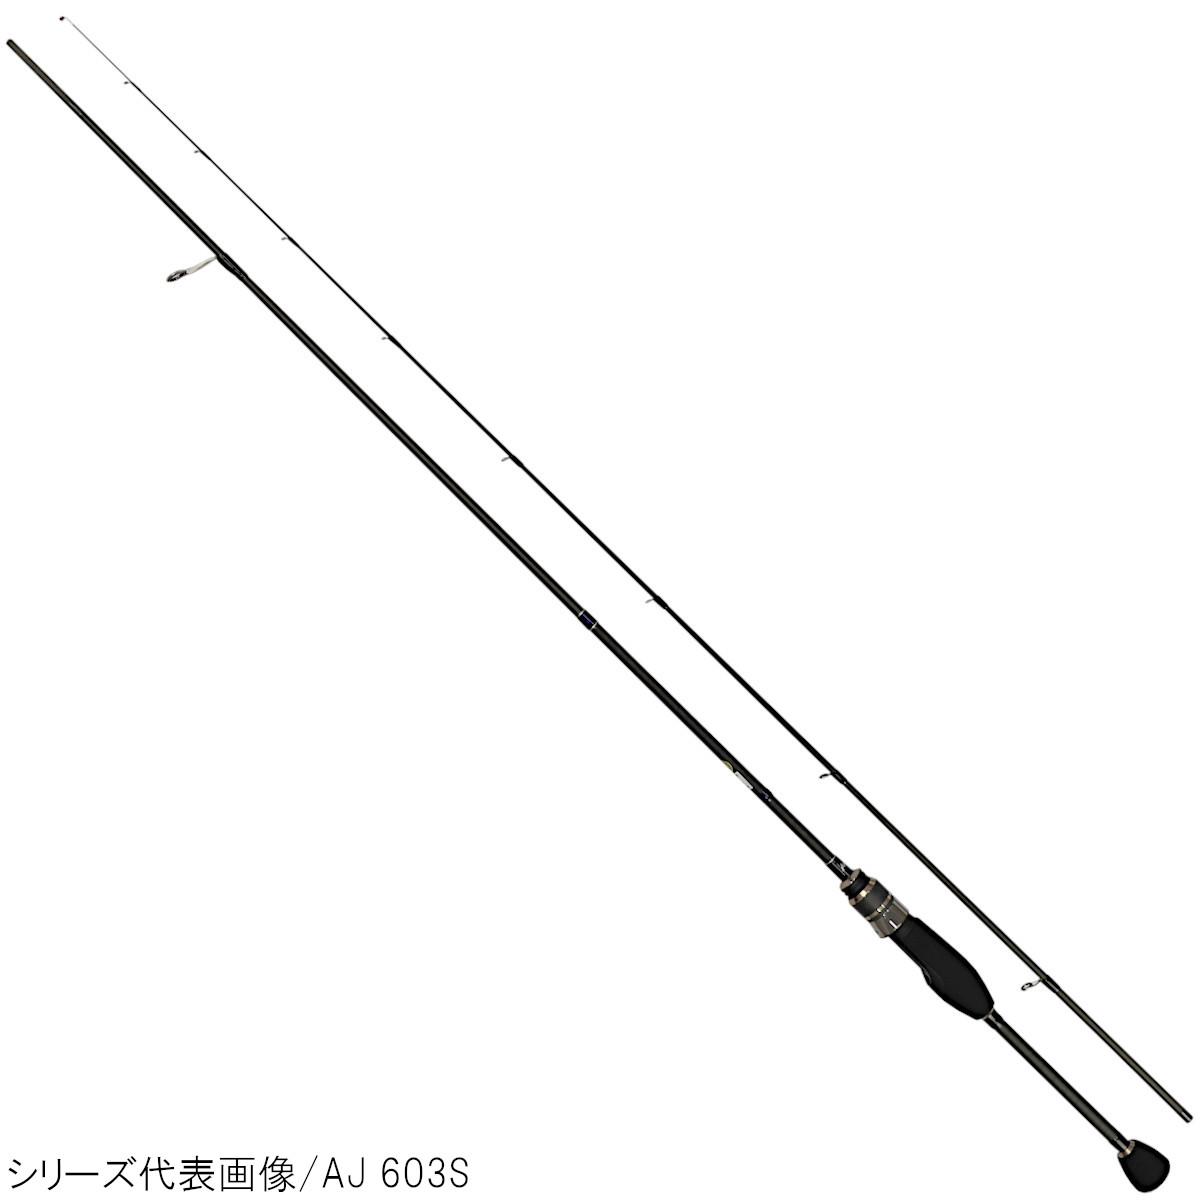 ARES ブルーポーター AJ 606S 宇崎日新【同梱不可】